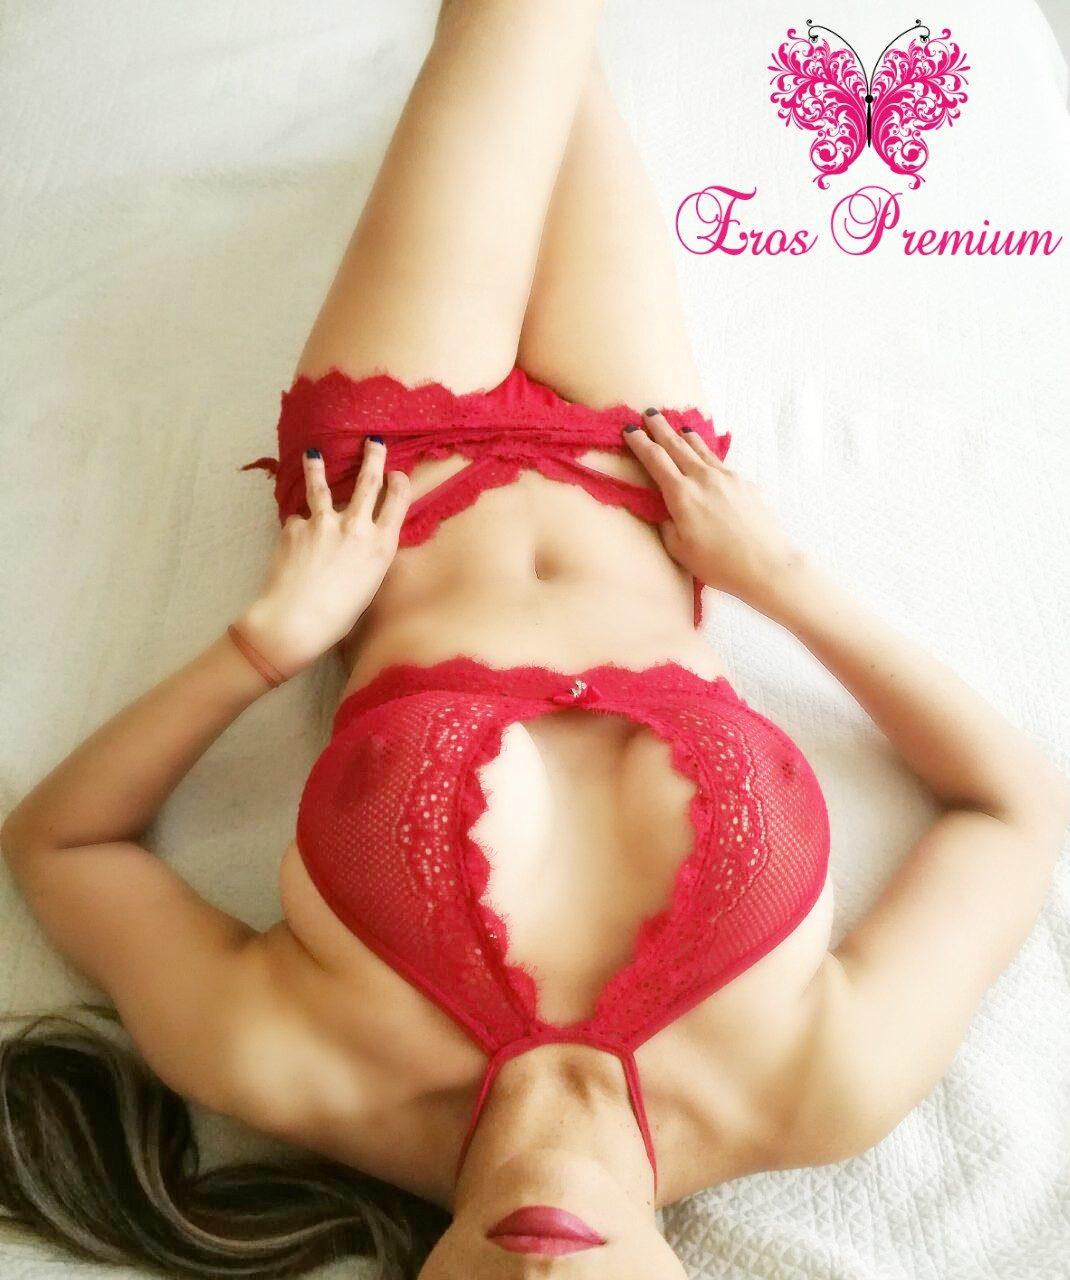 Viviana Prepago Bogotá Eros Premium 5